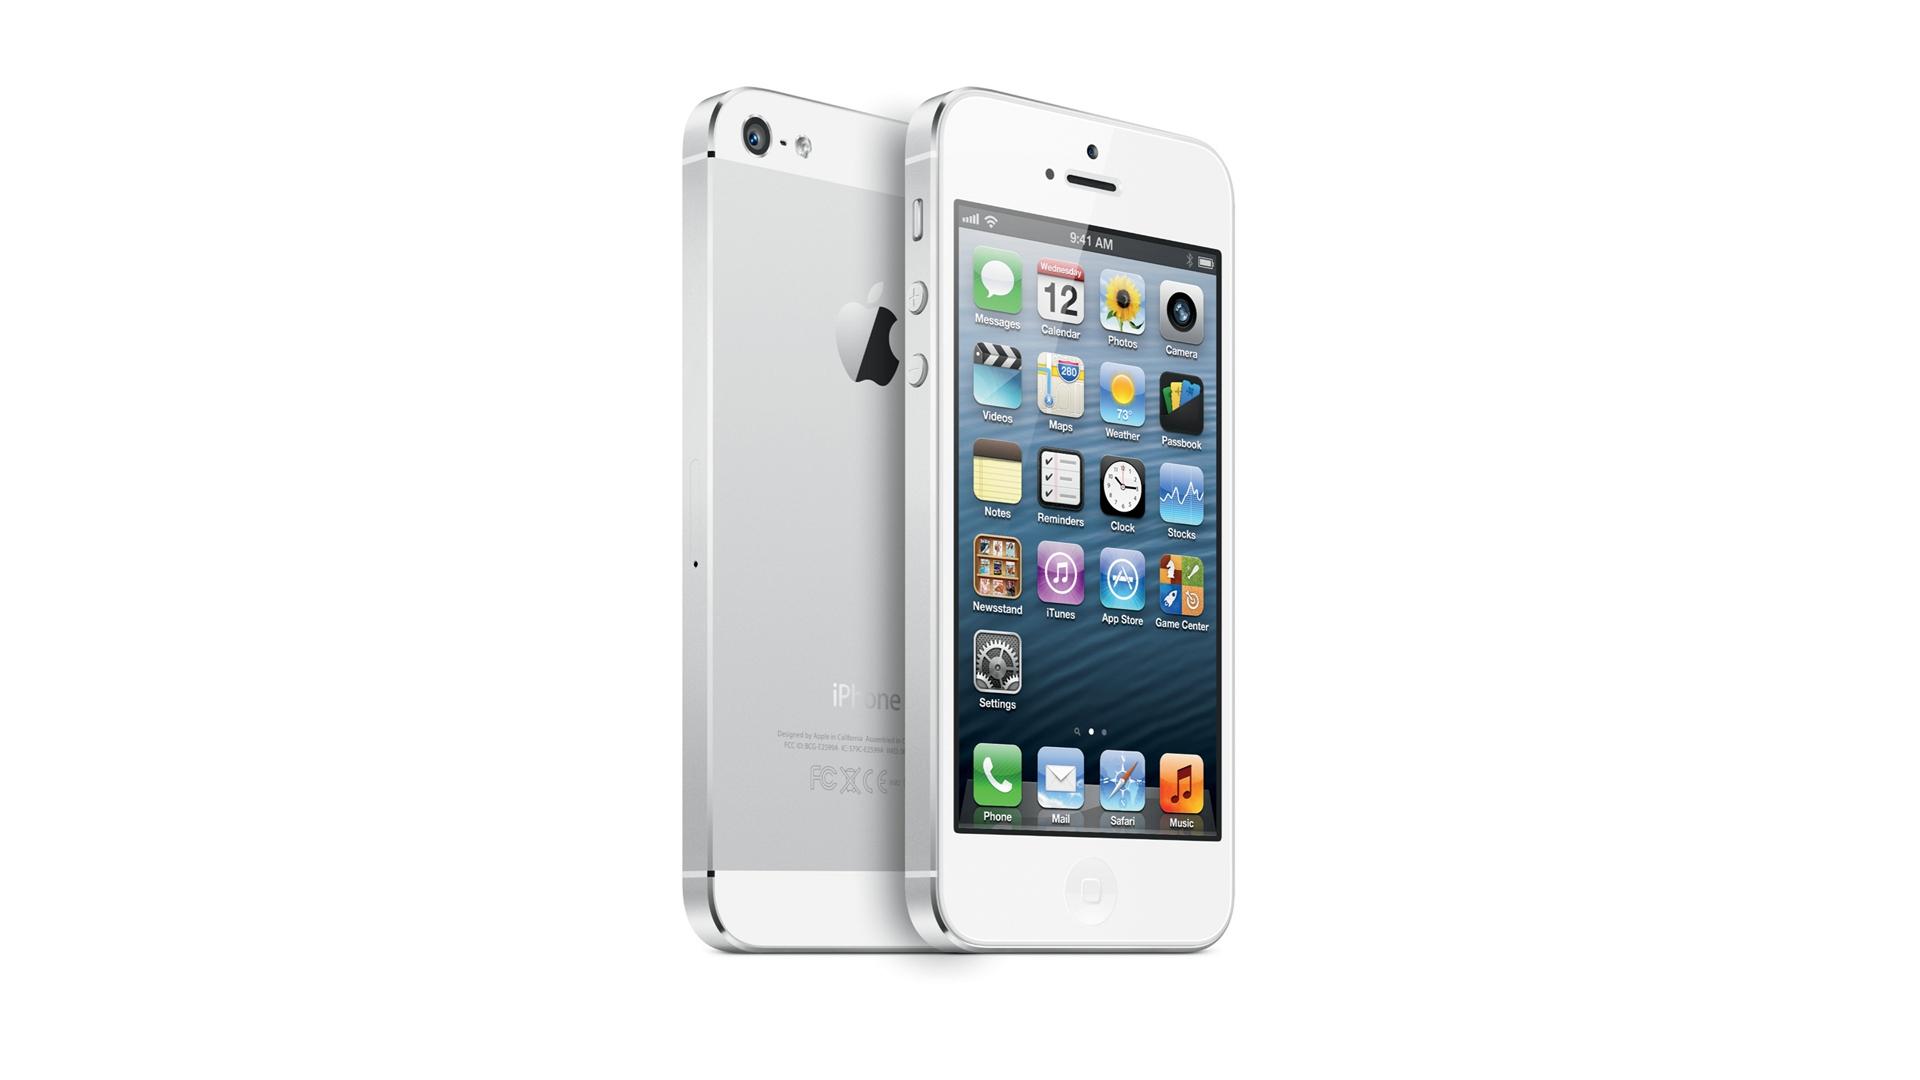 http://4.bp.blogspot.com/-K2Ge9kvILTU/UH5kuJEGwrI/AAAAAAAAMT4/_TLKby3DQaQ/s0/white-iphone-5-1920x1080-wallpaper.jpg